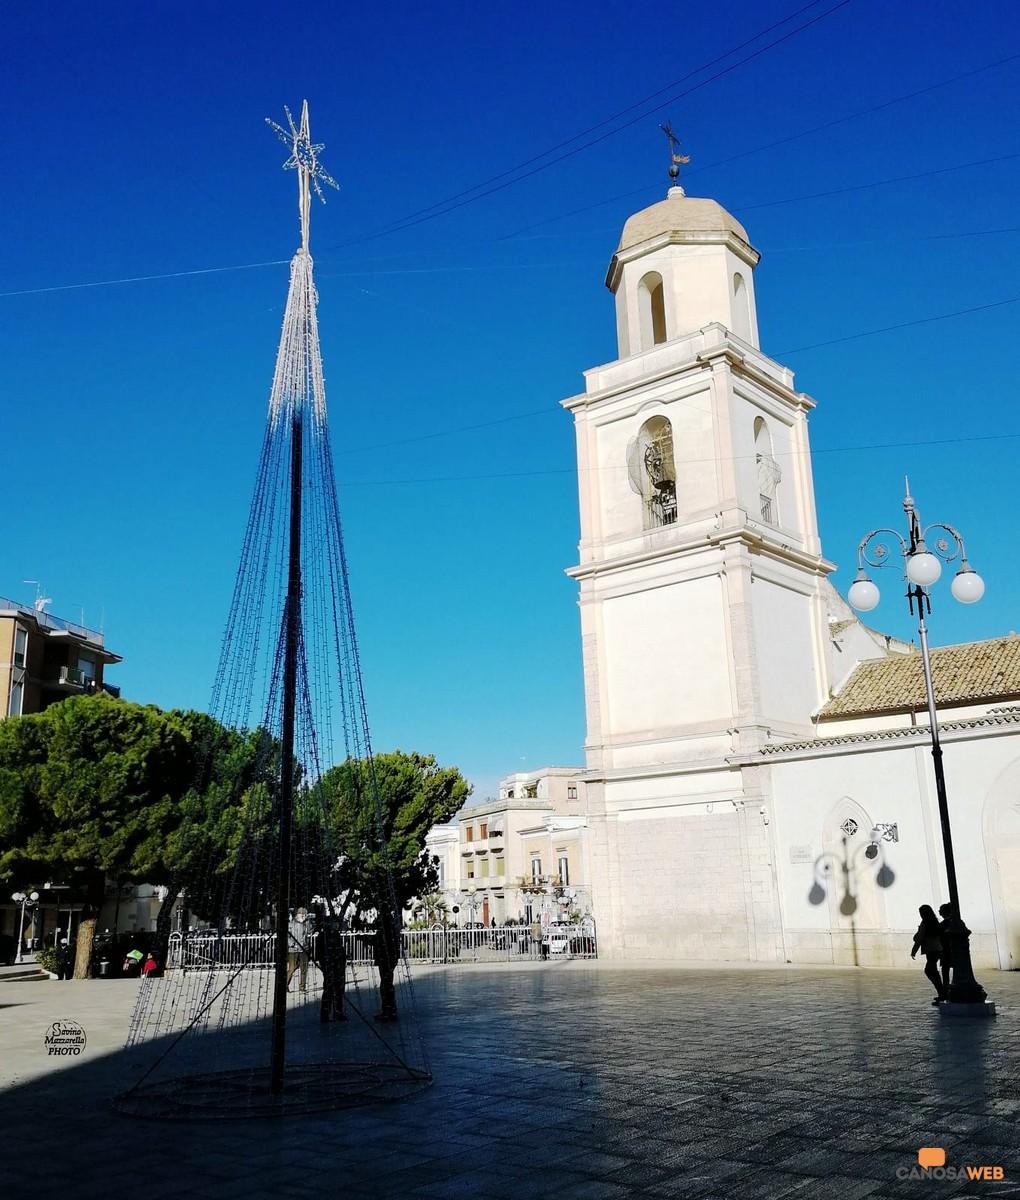 2020 Natale a Canosa di Puglia